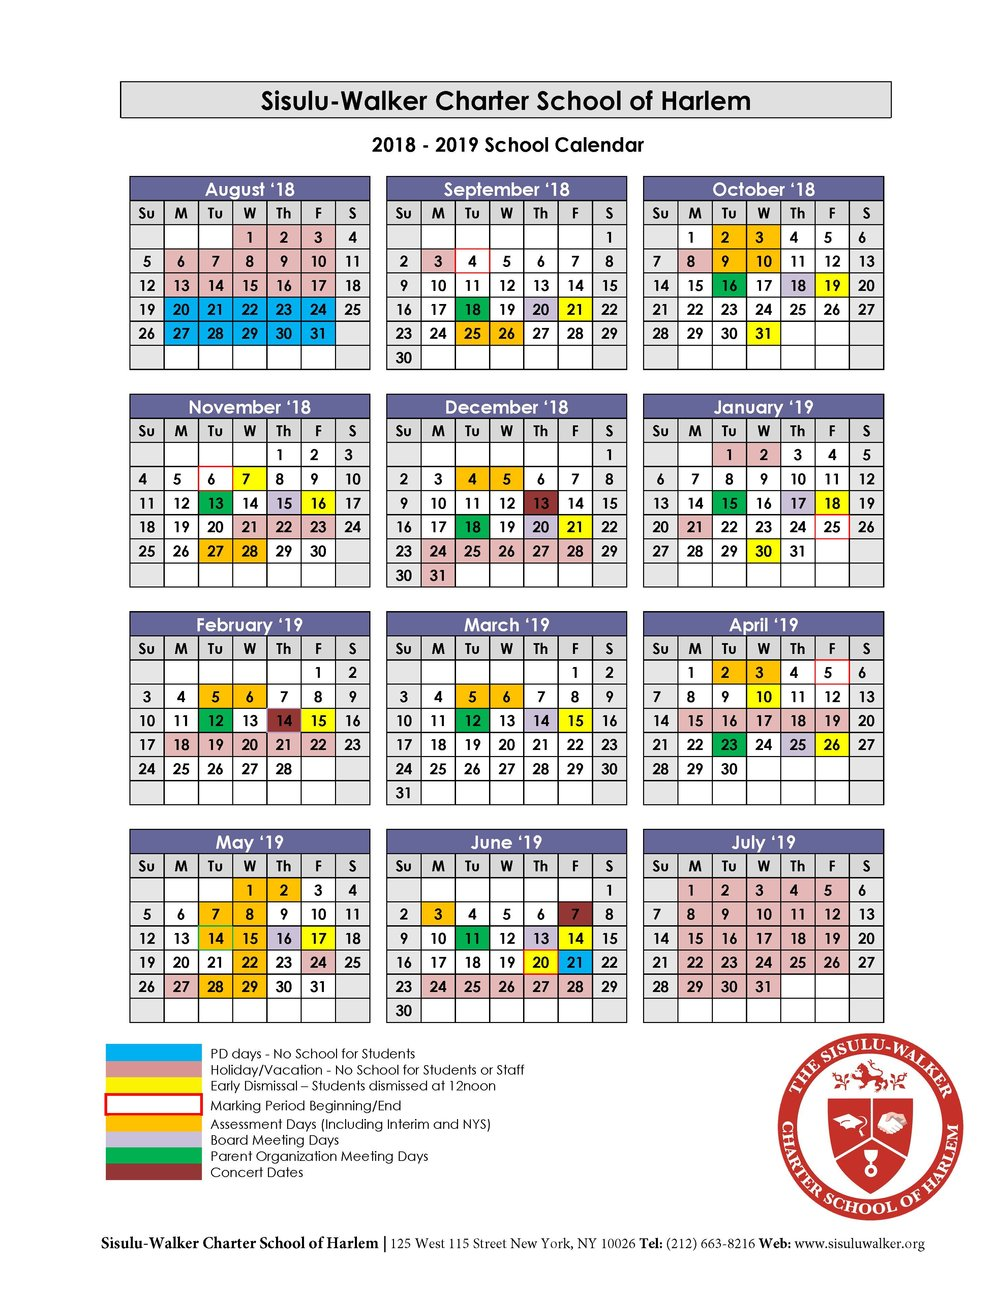 SWCSH 2018-19 School Calendar